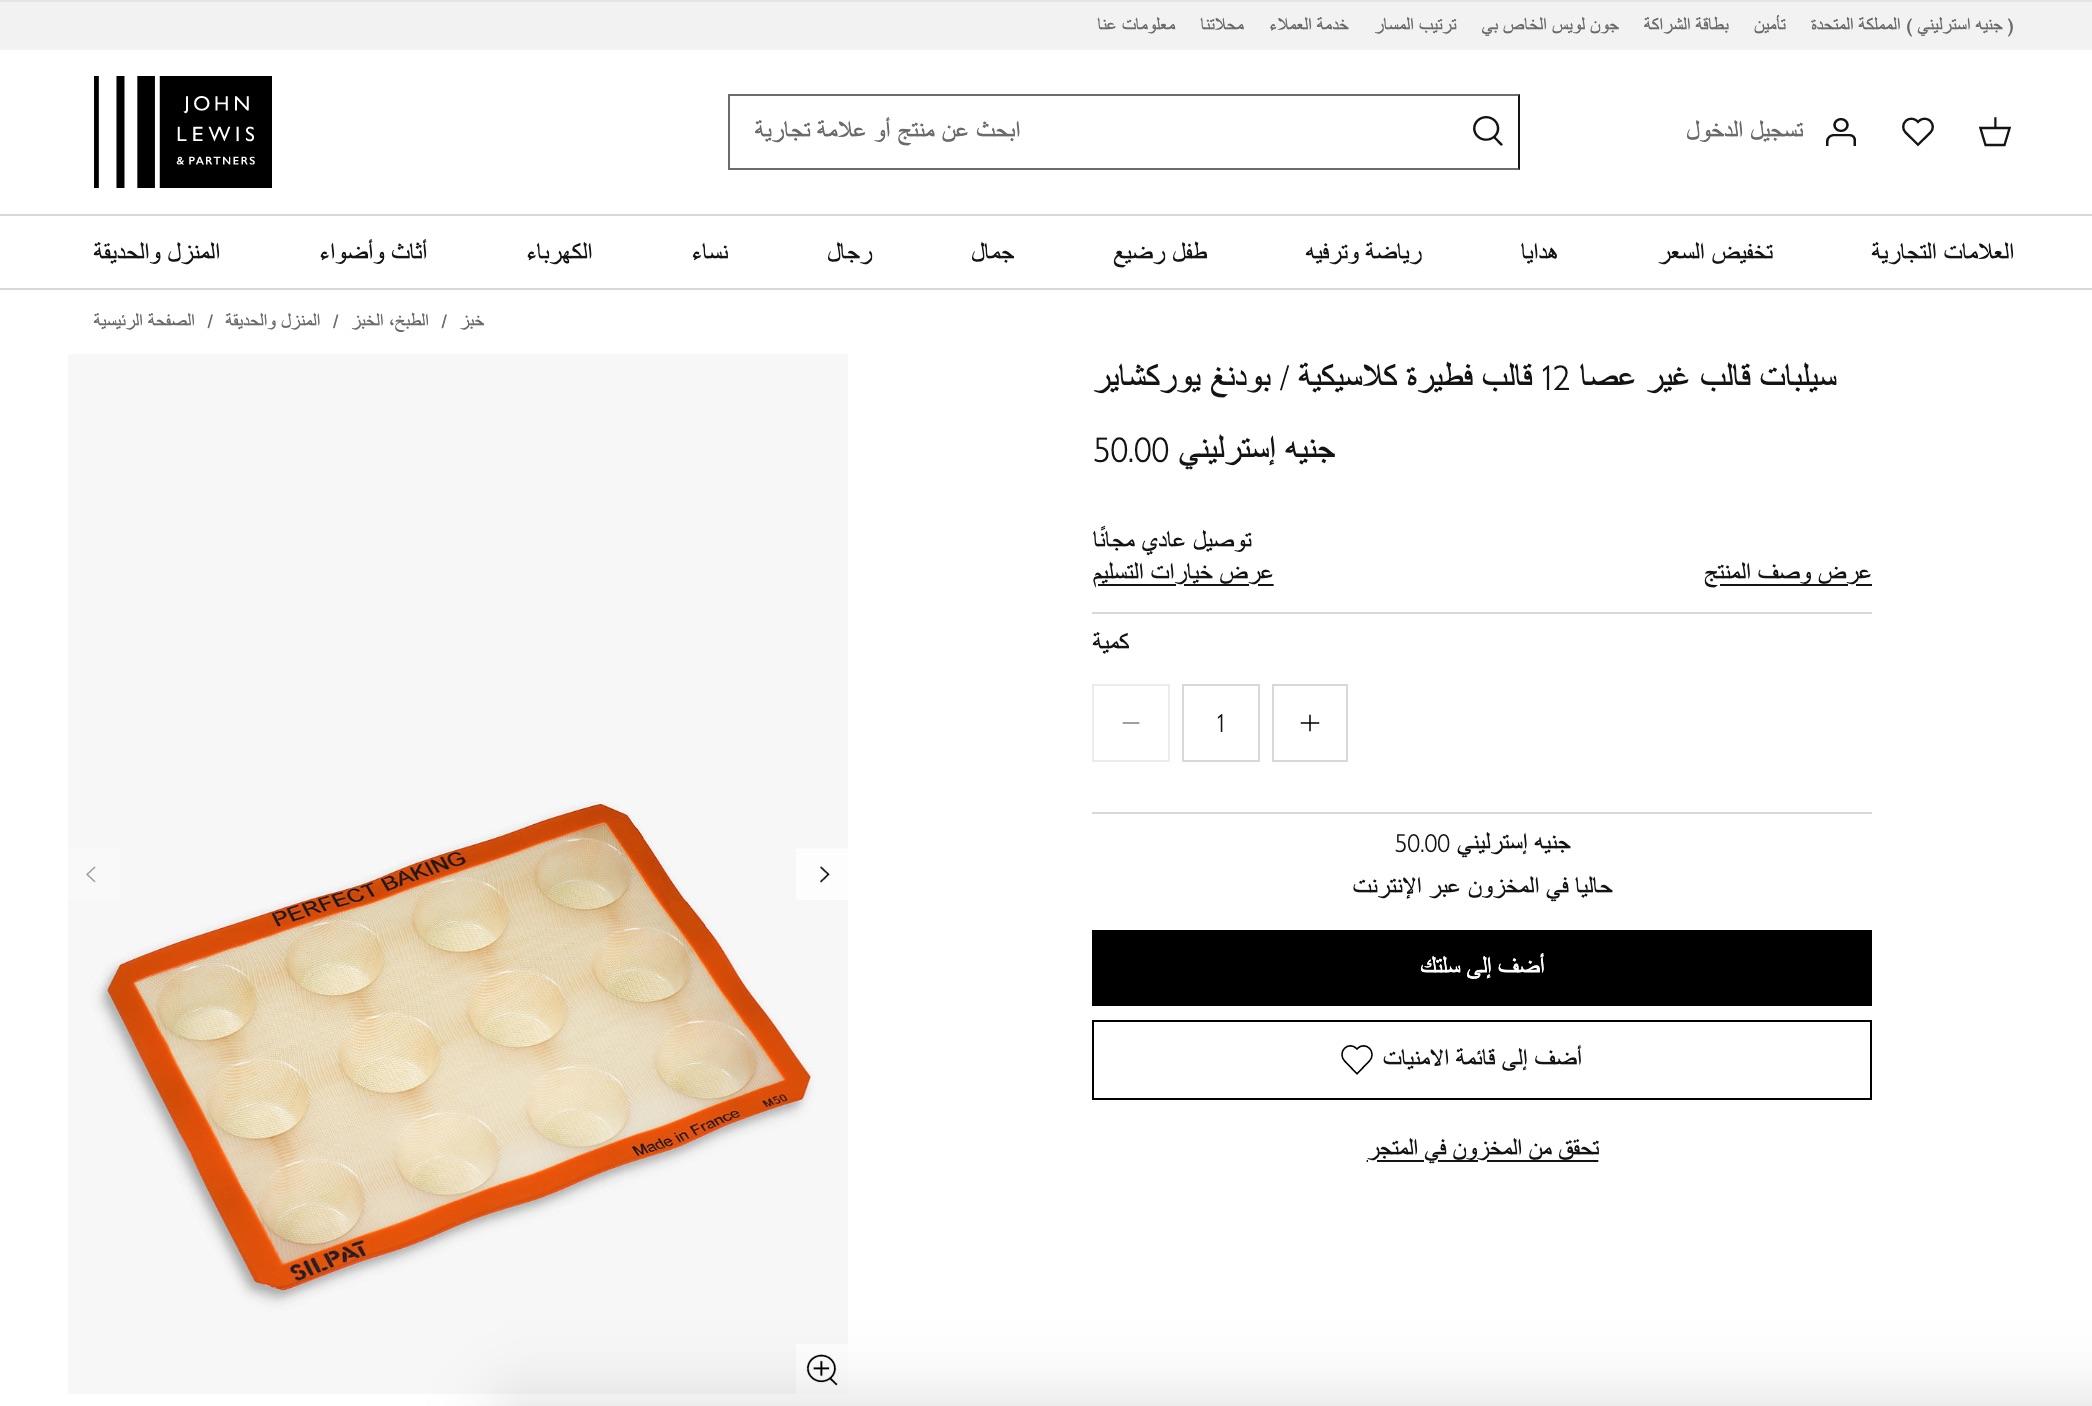 Screenshot of John Lewis website translated into Arabic